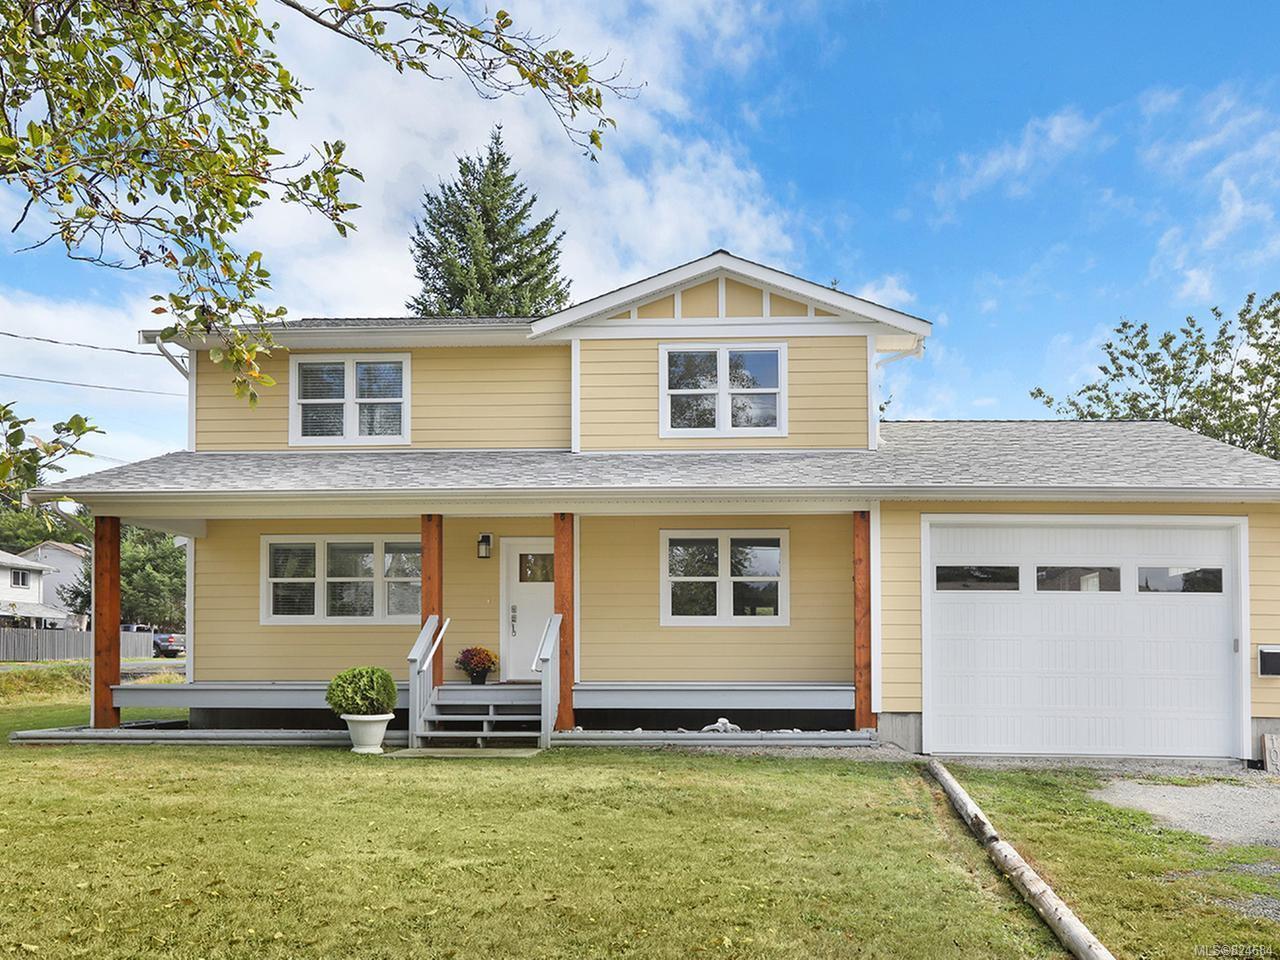 Main Photo: 103 S McPhedran Rd in CAMPBELL RIVER: CR Campbell River Central House for sale (Campbell River)  : MLS®# 824684